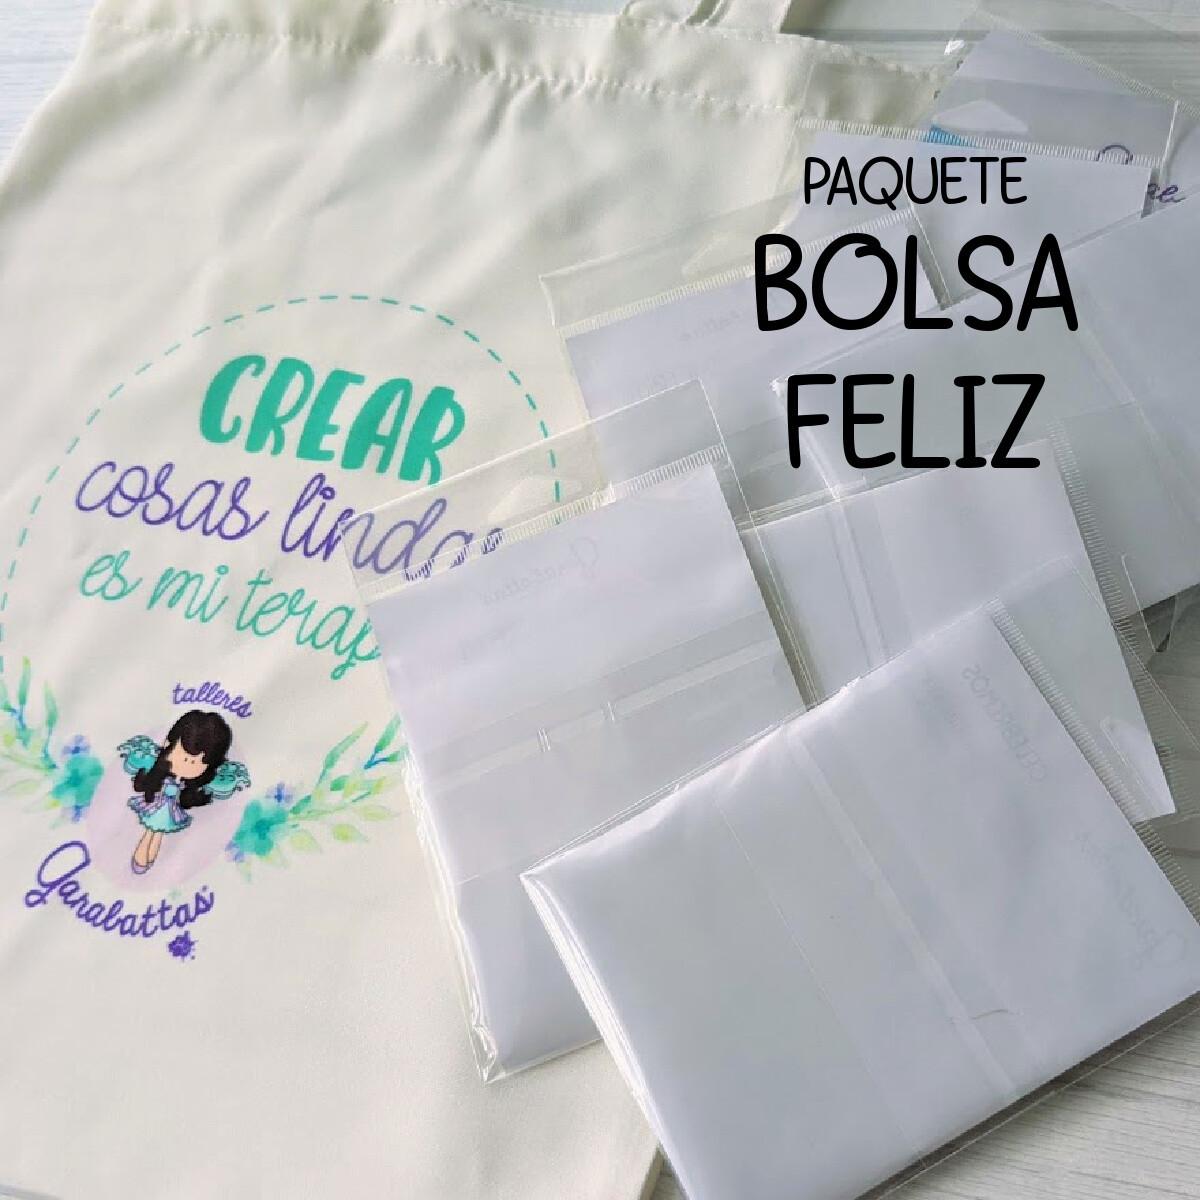 PAQUETE BOLSA FELIZ